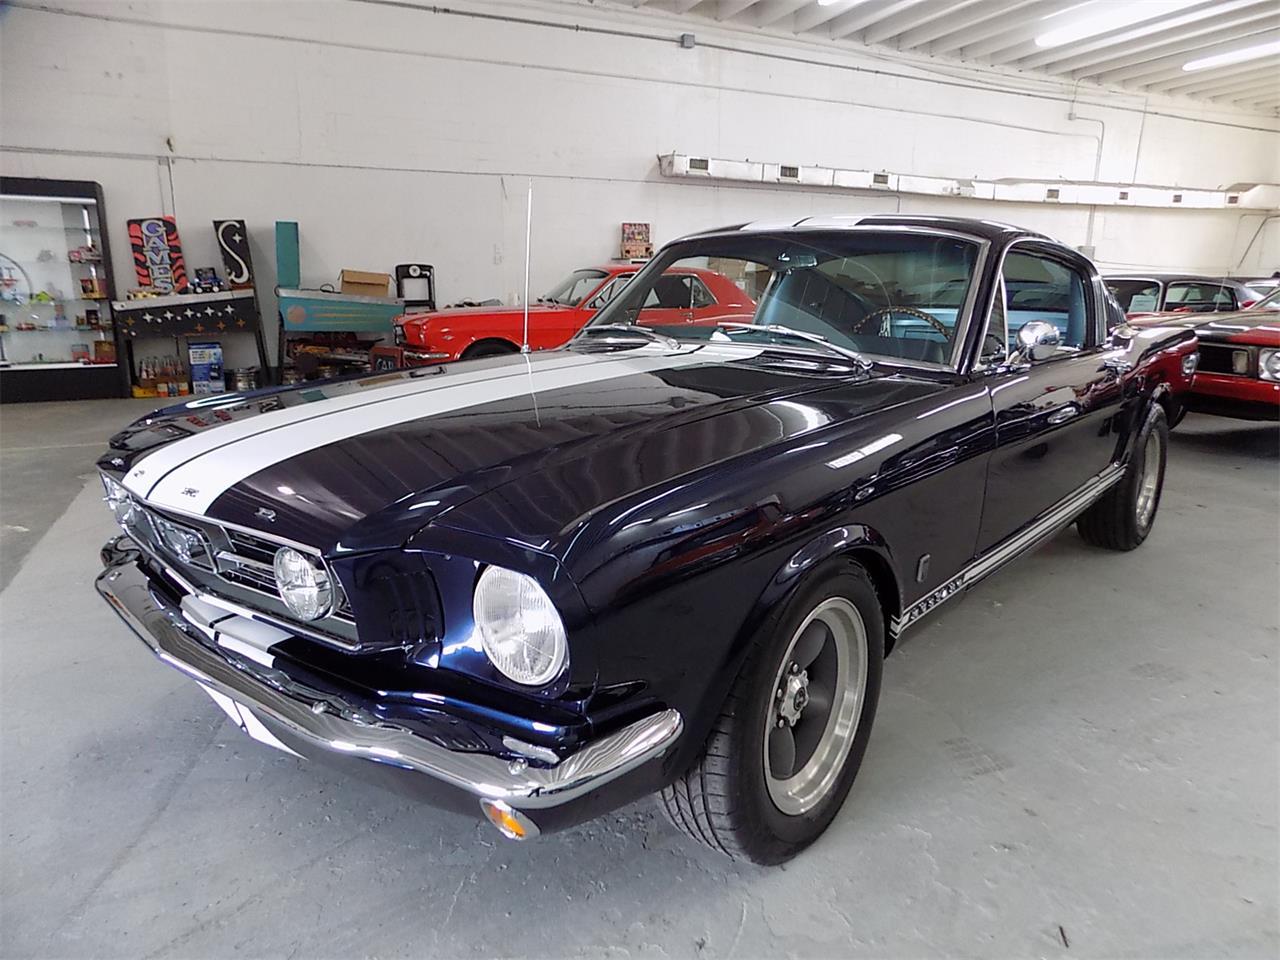 Ford Mustang Fastback gt v8 1966 prix tout compris 1966